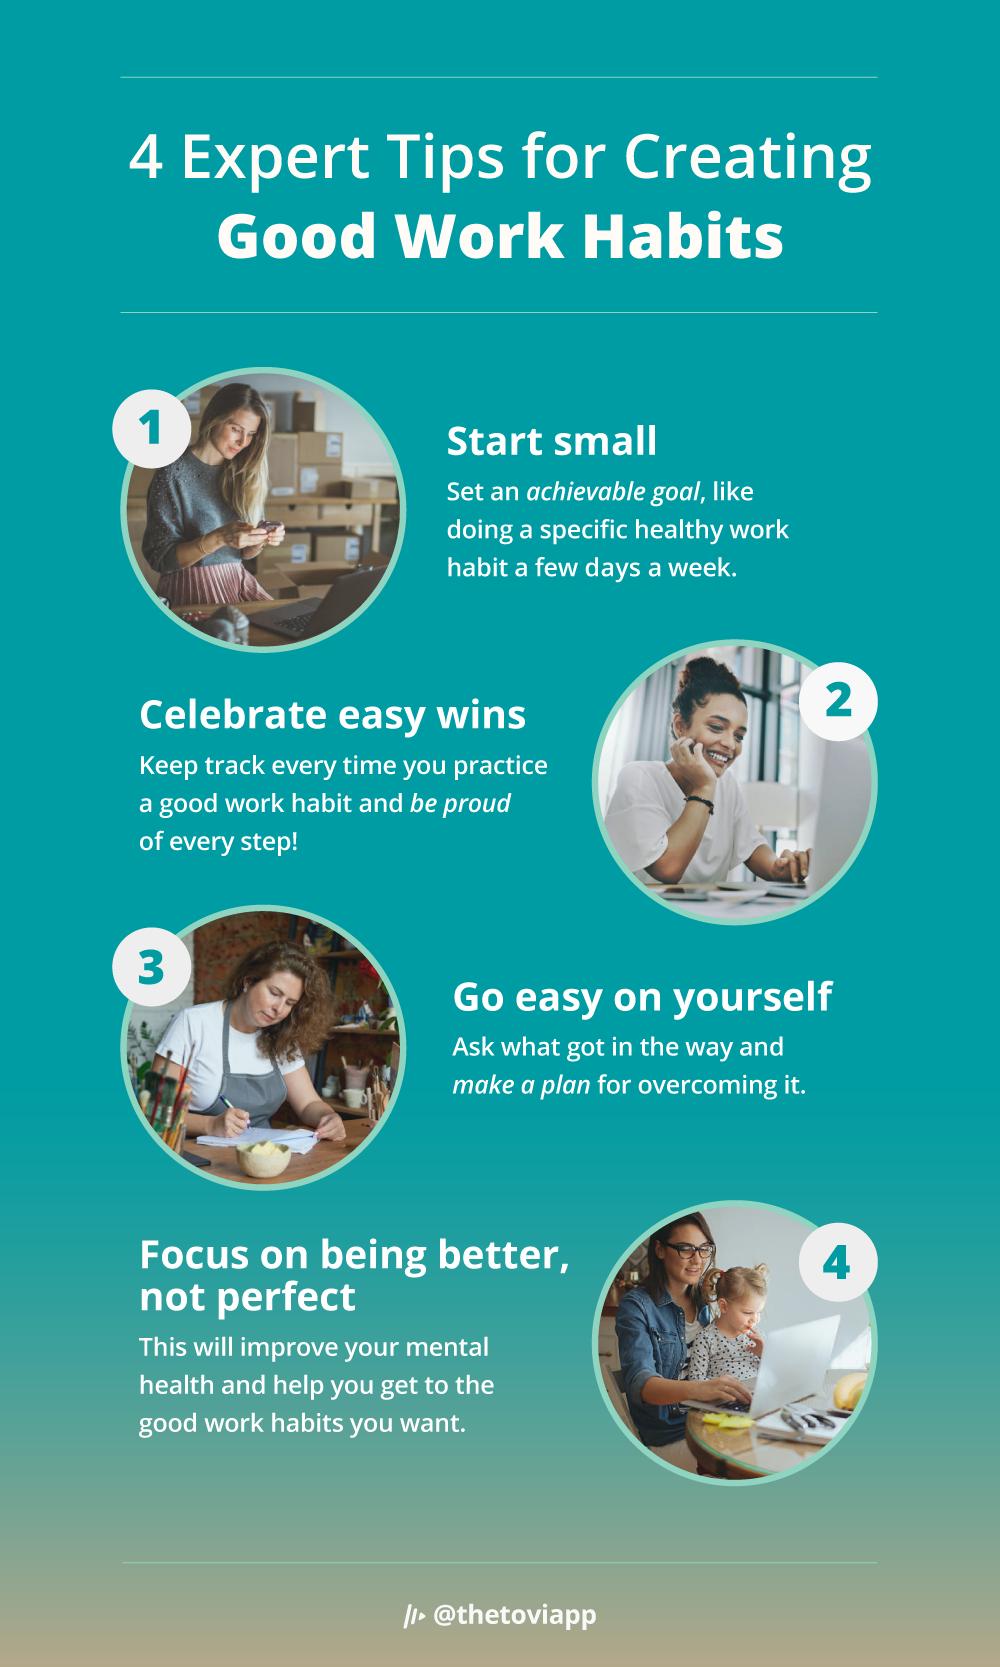 Infographic explaining 4 expert tips for creating good work habits